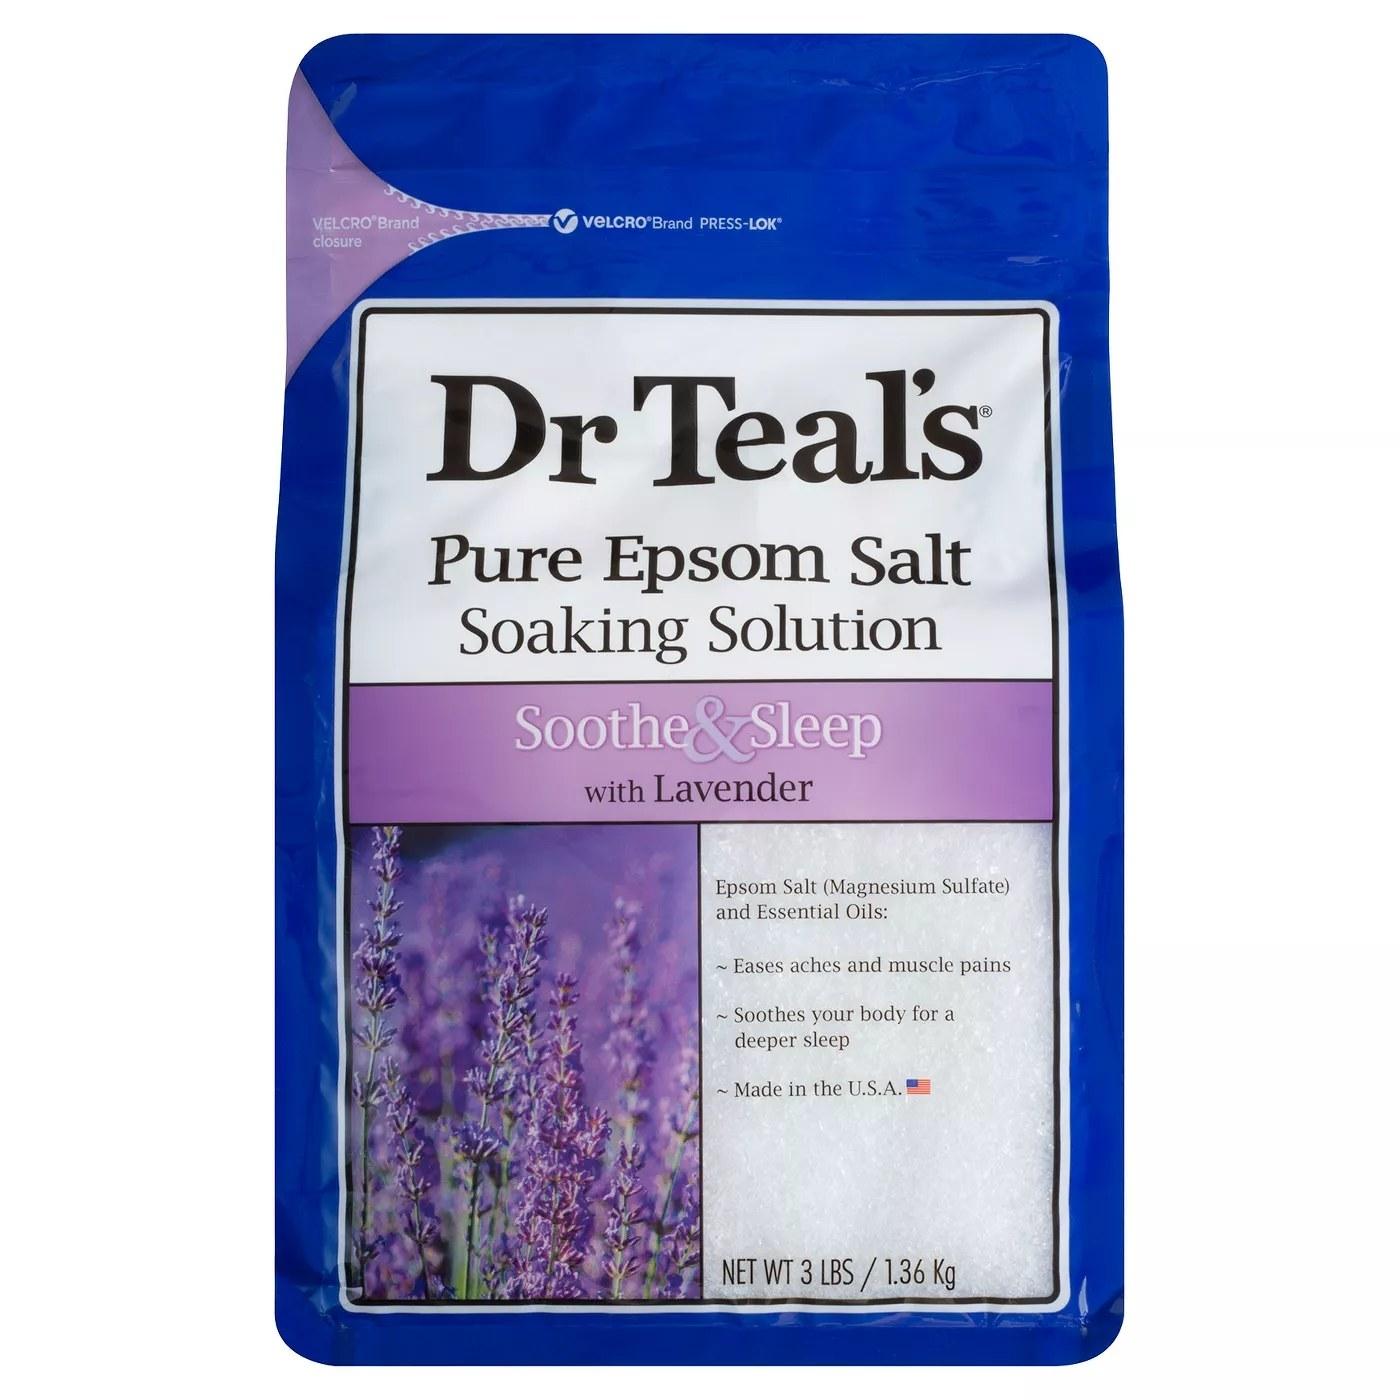 The blue package of epsom salt soaking solution